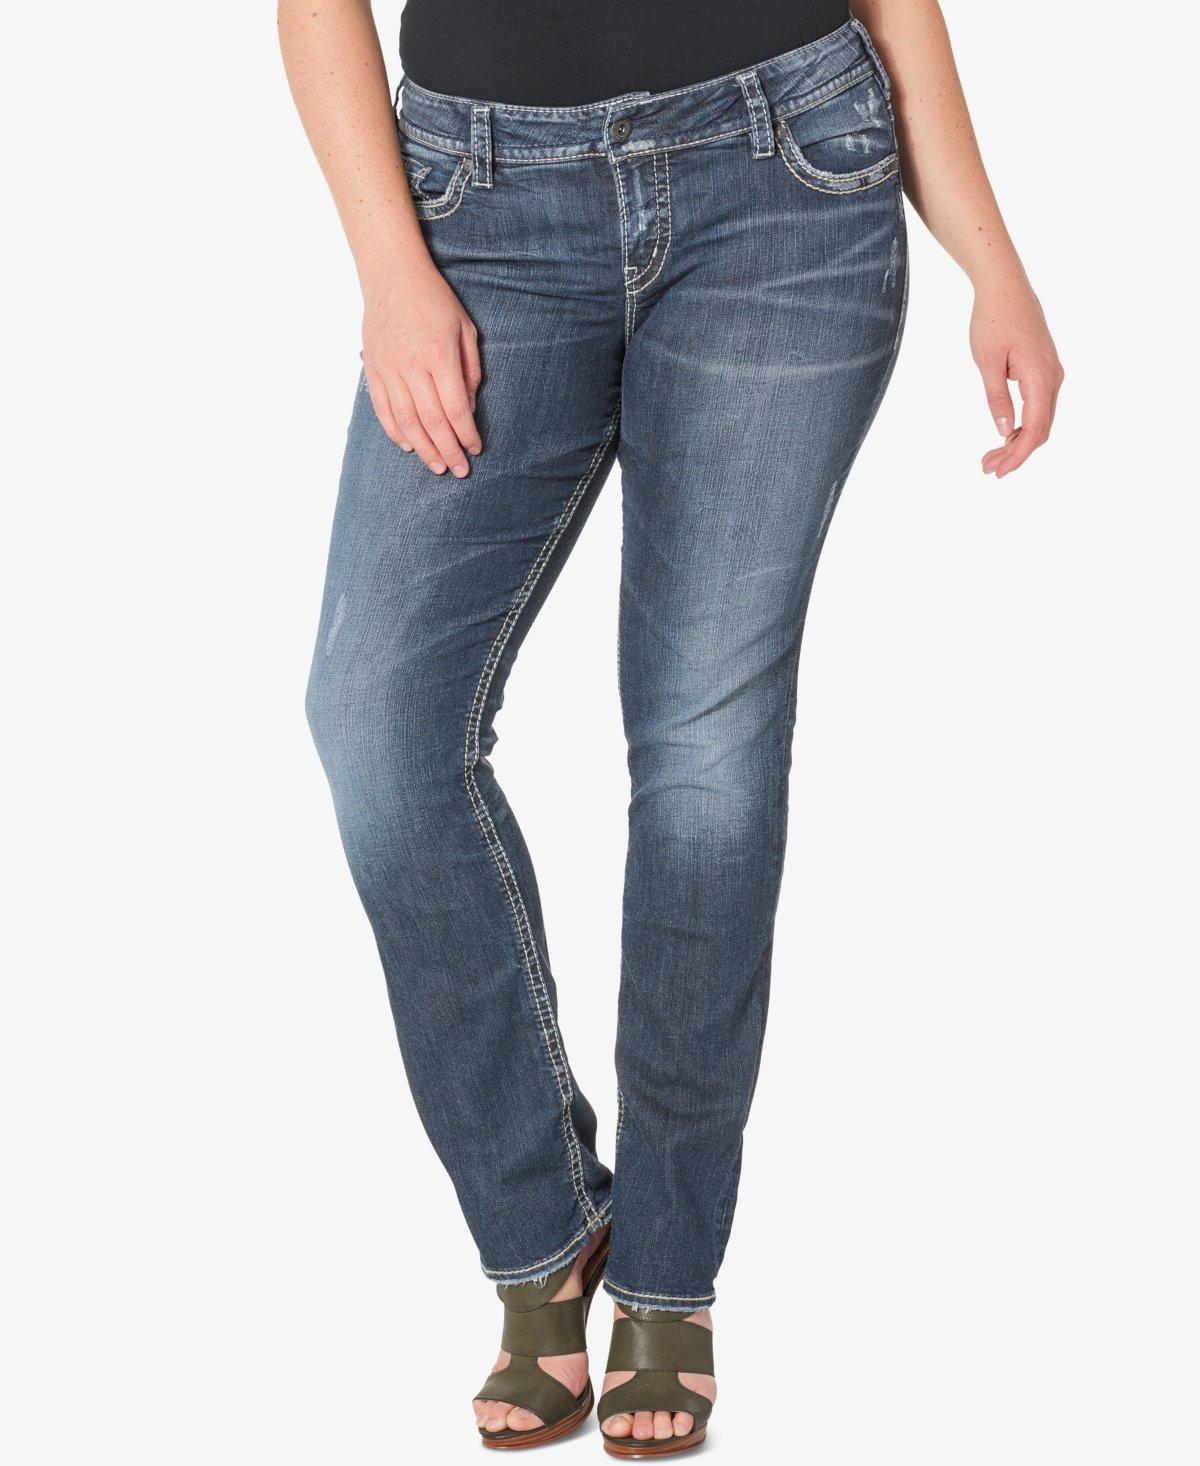 Silver Jeans Co. Women's Plus Size Suki Curvy Fit Mid Rise Straight Leg Jeans, Vintage Dark Wash with Lurex Stitch, 16x30